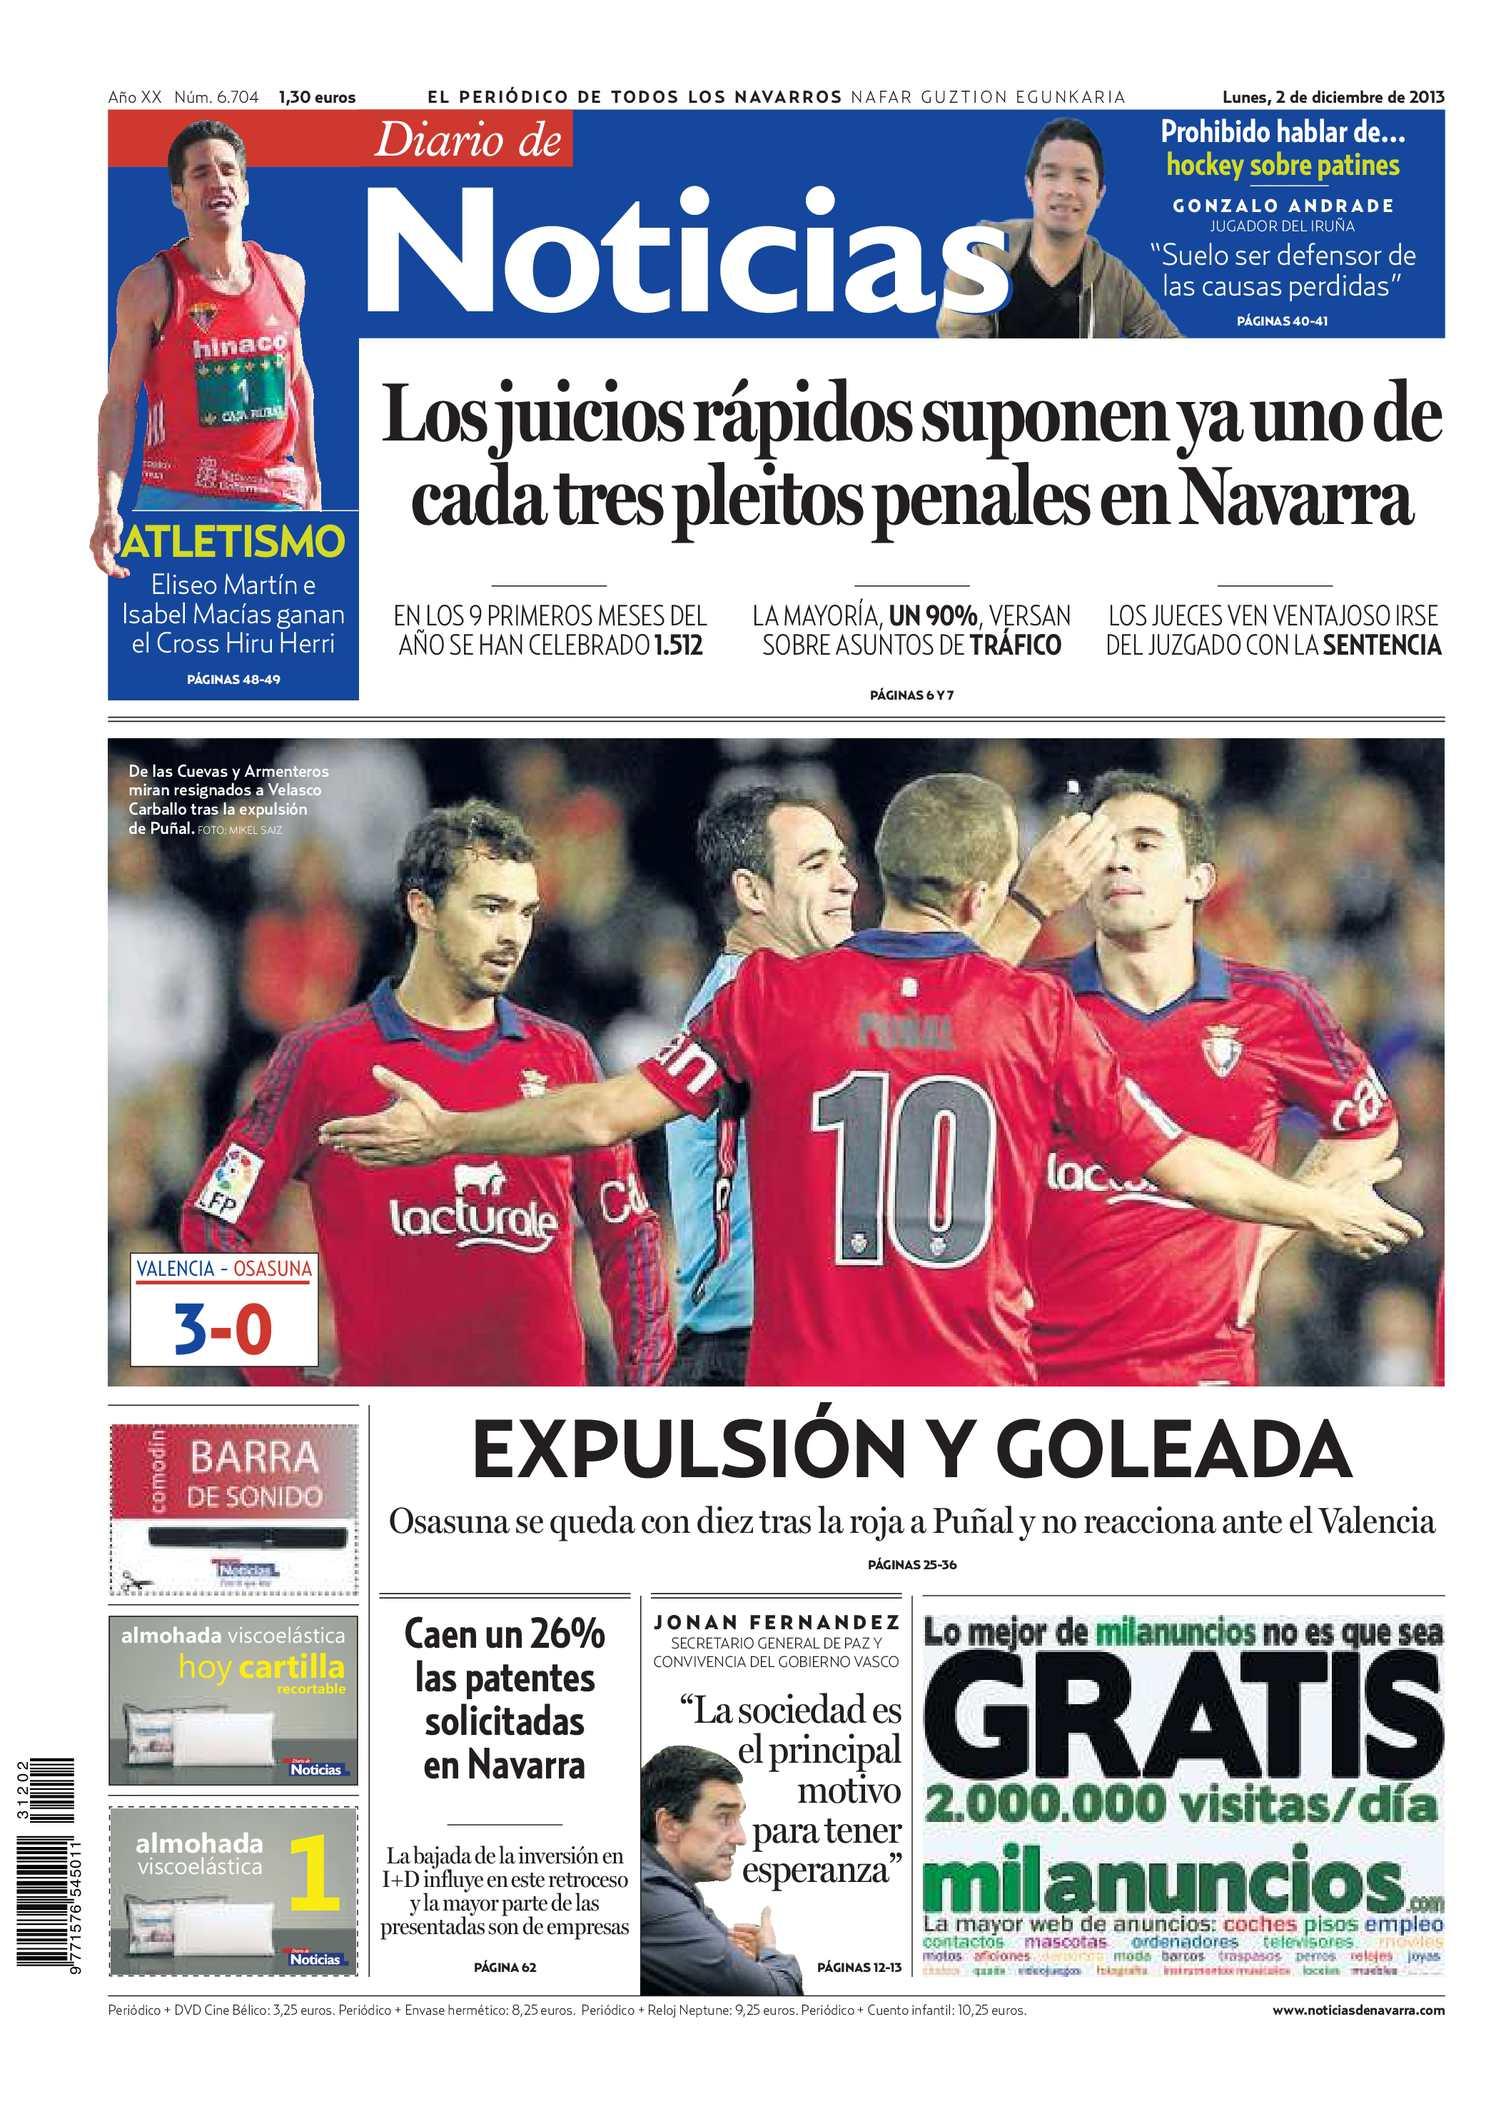 Ainhoa Madrid David Moreno Porno calaméo - diario de noticias 20131202